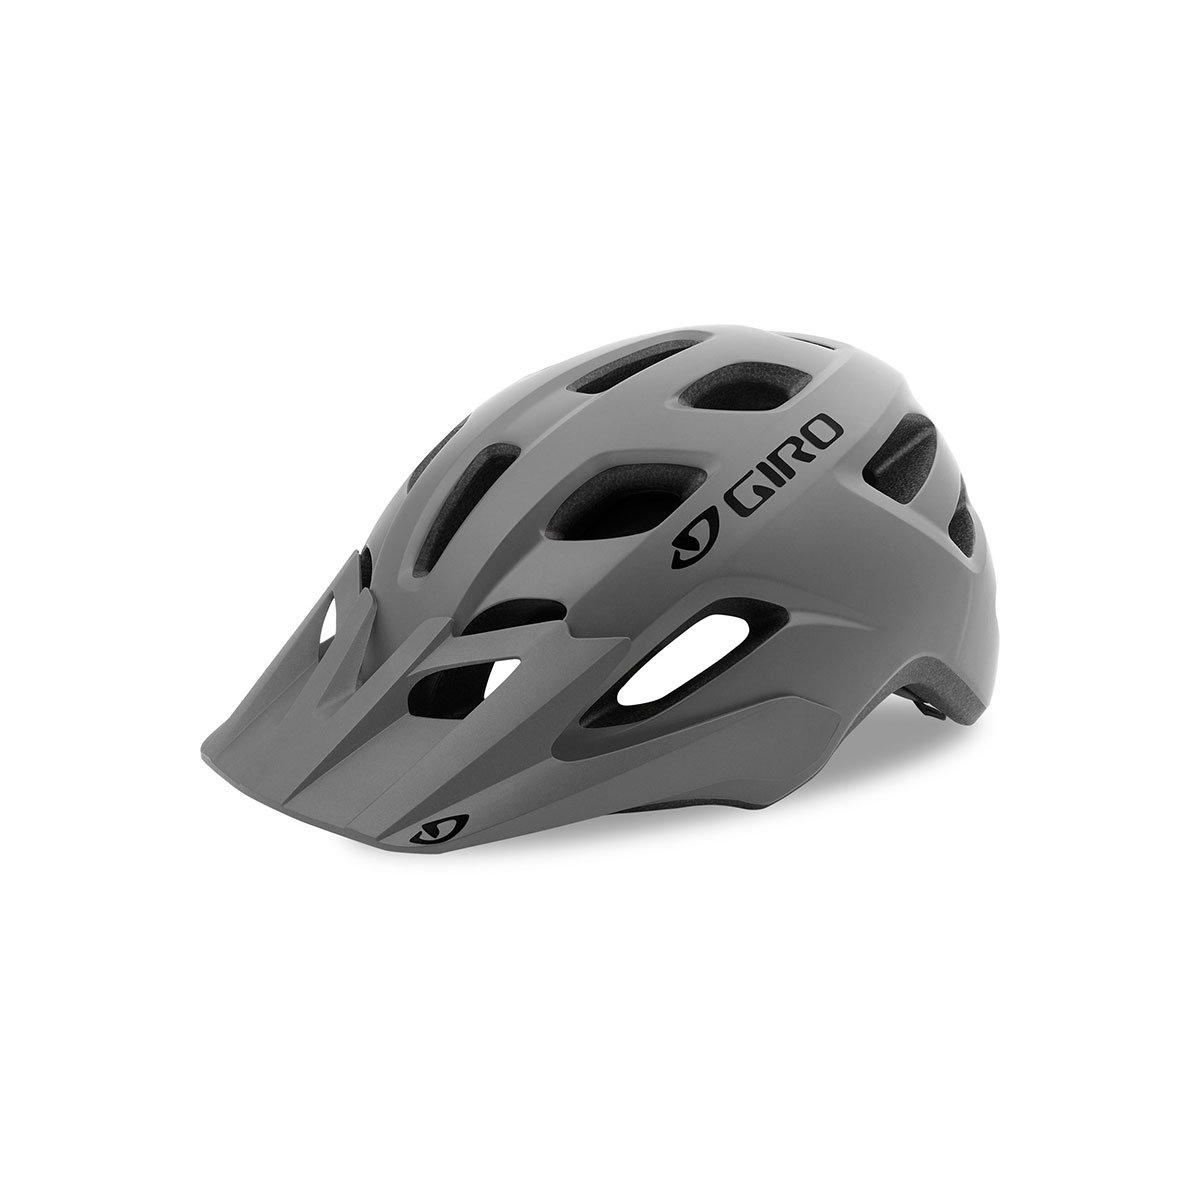 Giro Fixture MIPS Bike Helmet - Matte Grey by Giro